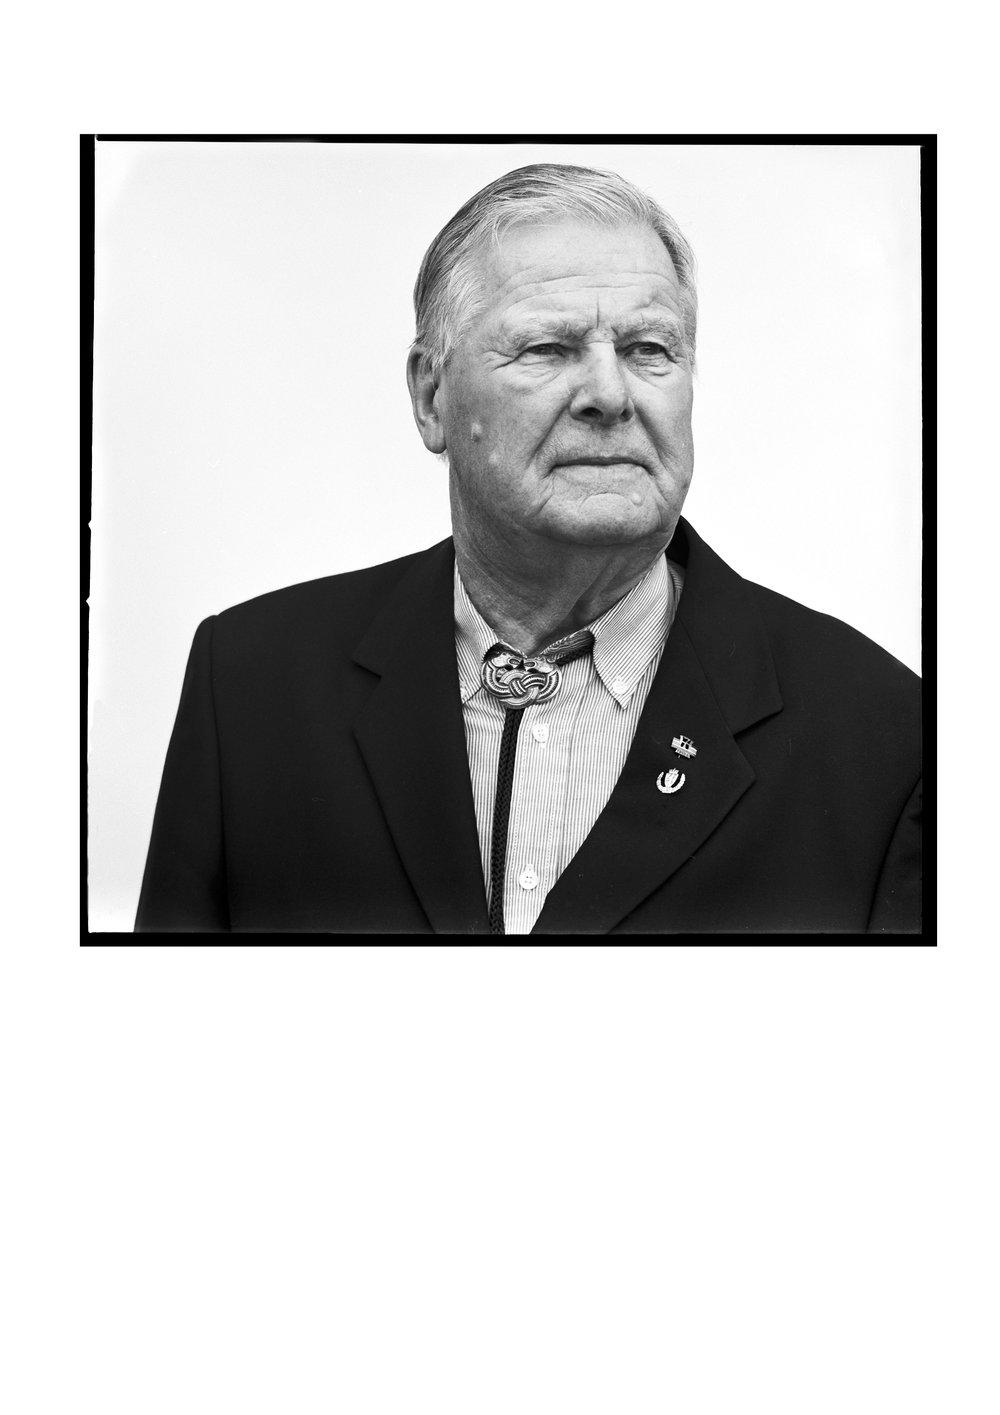 WW2 veteran Klaus Fjeld